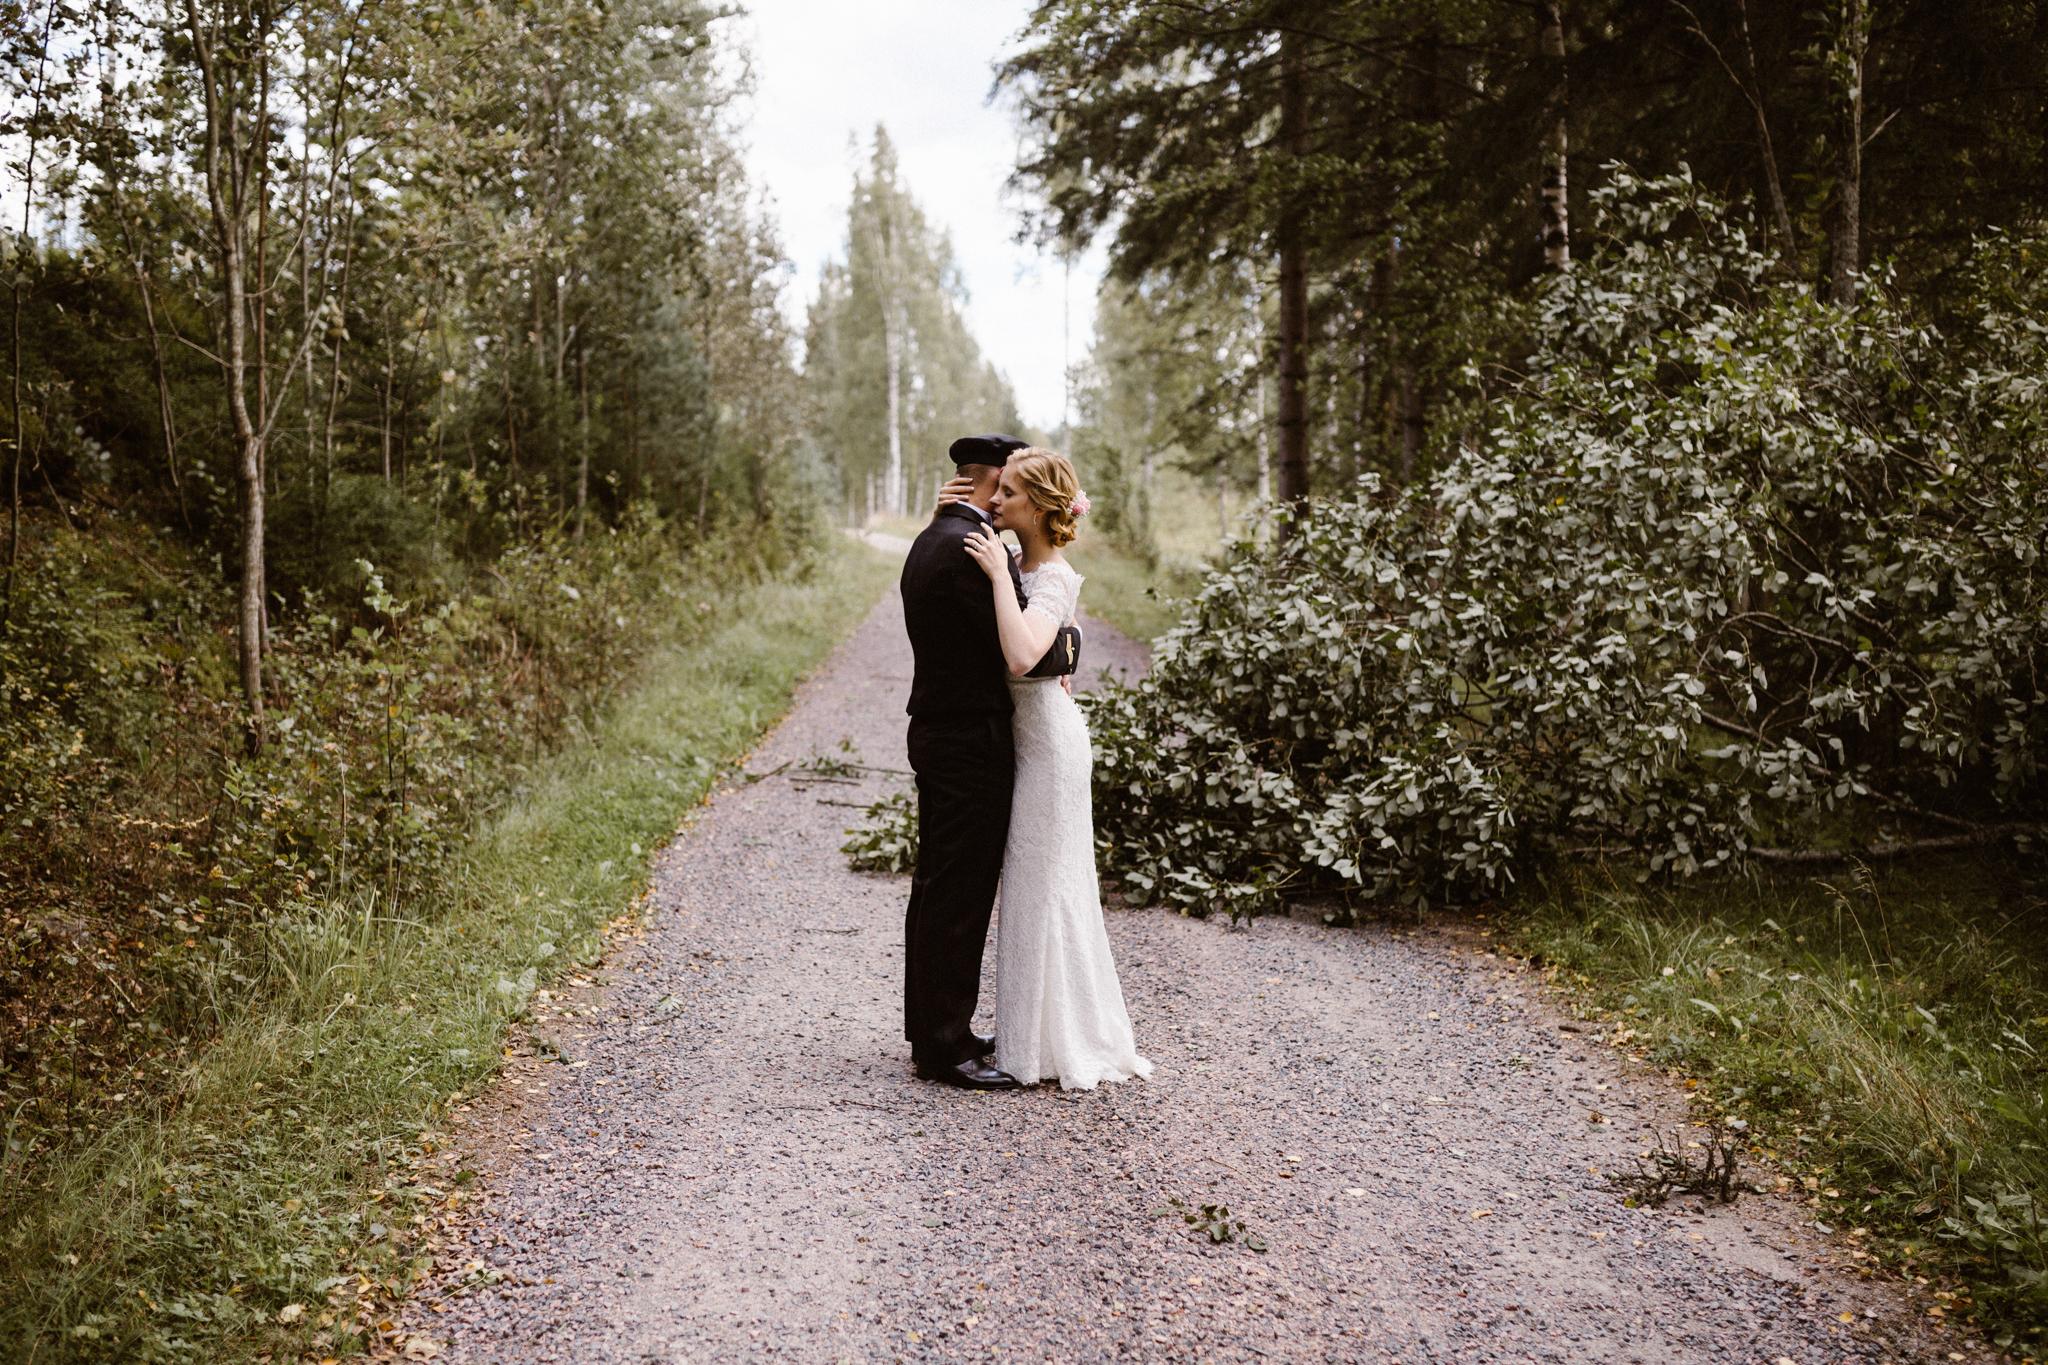 Pinja + Marko -- Patrick Karkkolainen Wedding Photographer-113.jpg